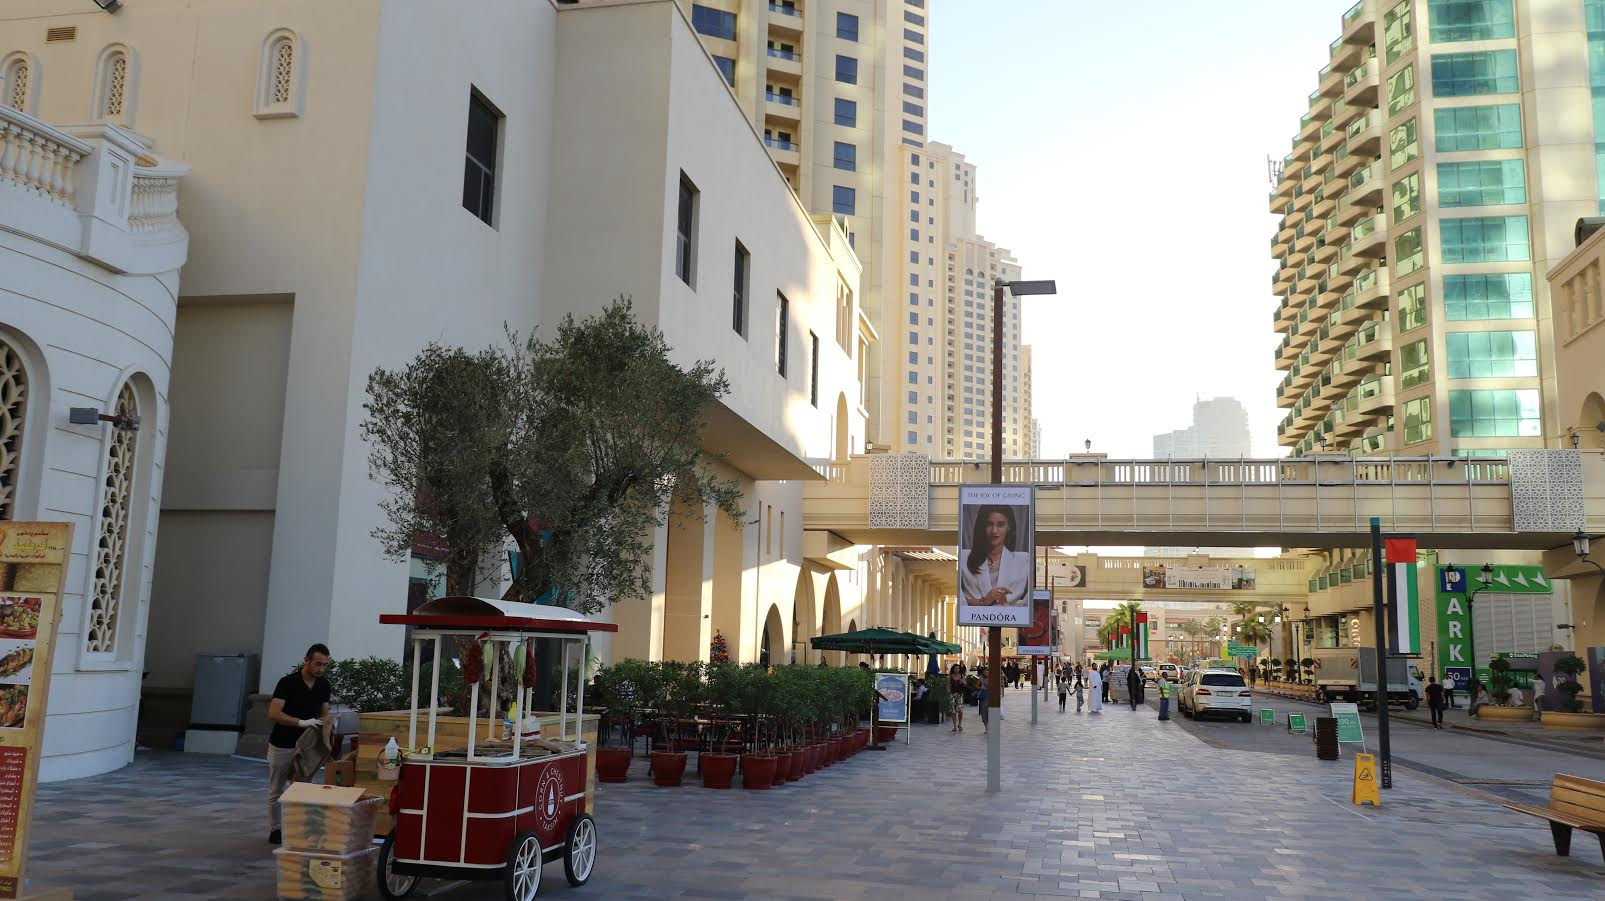 عروض أبرز مطاعم باي أفينو و باي سكوير و جميرا بيتش ريزيدنس خلال رمضان 2017